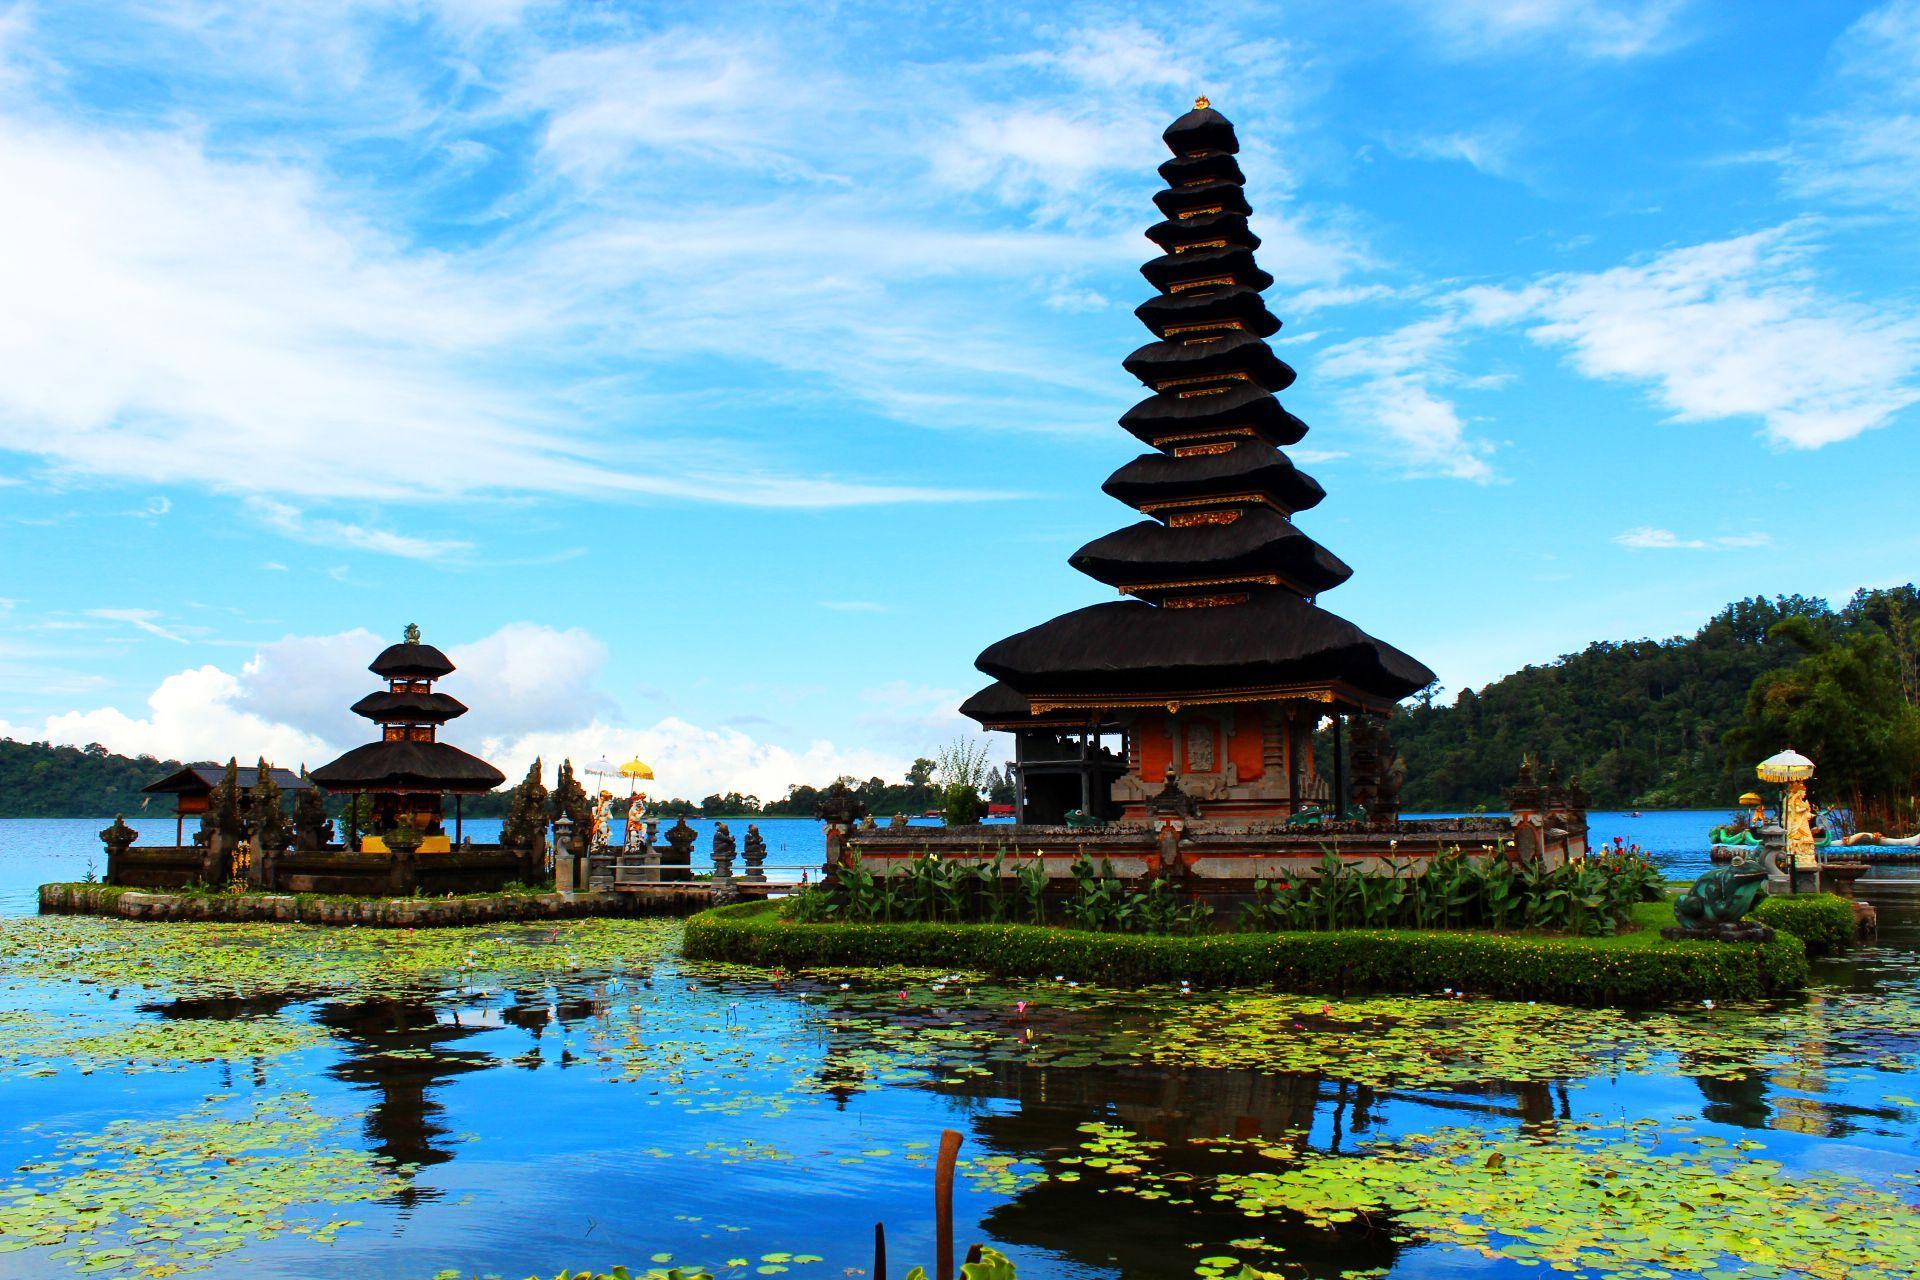 Bali Indonesia Wallpapers Top Free Bali Indonesia